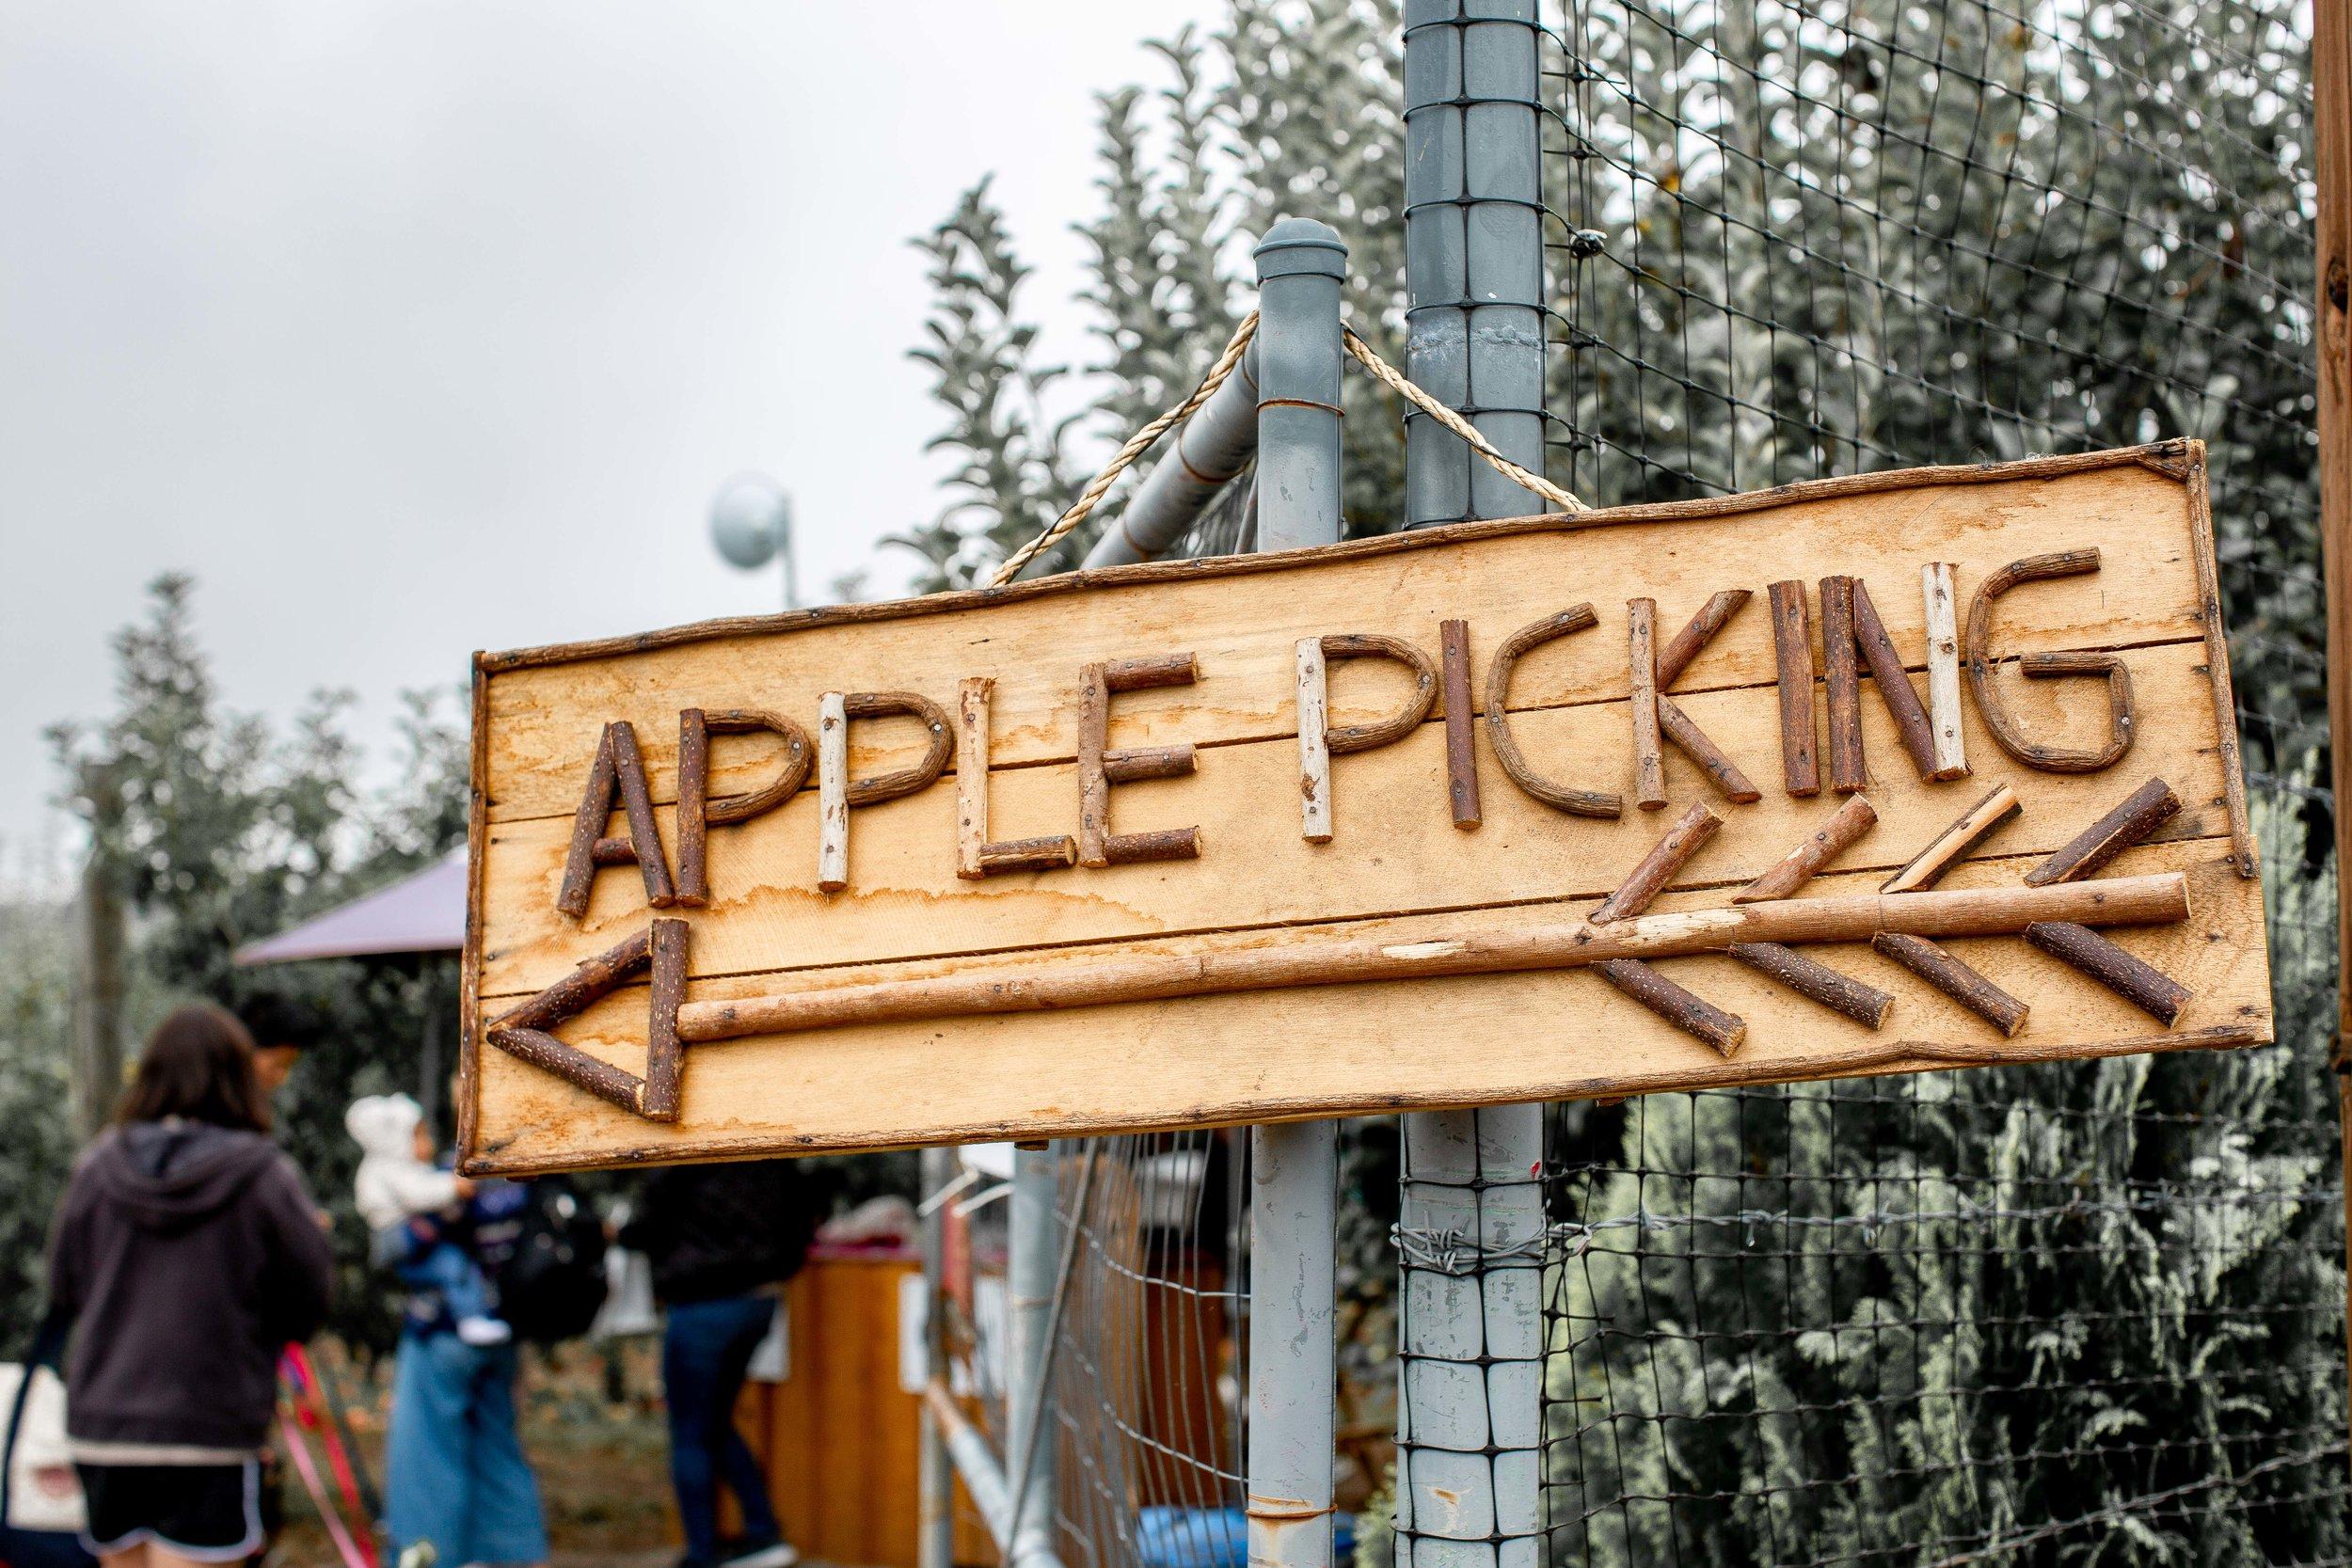 fizz-fade-apple-picking-11.jpg